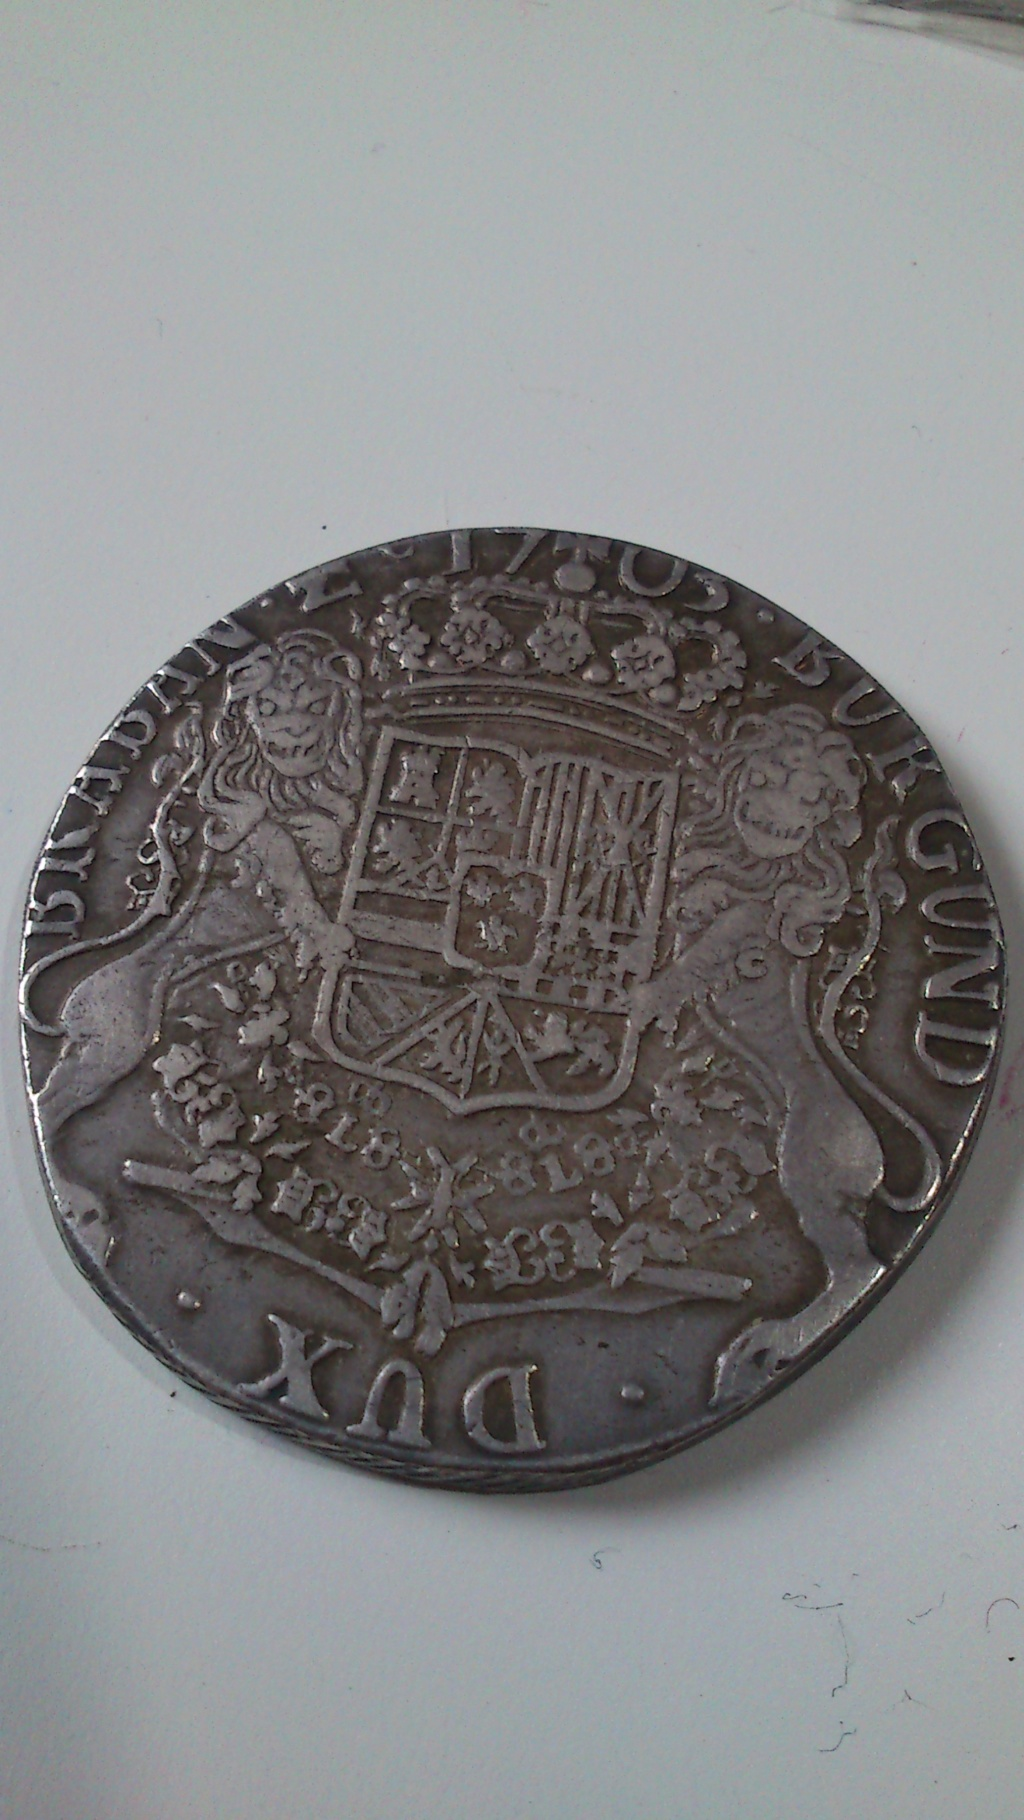 DUCATON de Felipe V Brabante (Amberes) 1703 Dsc_0068